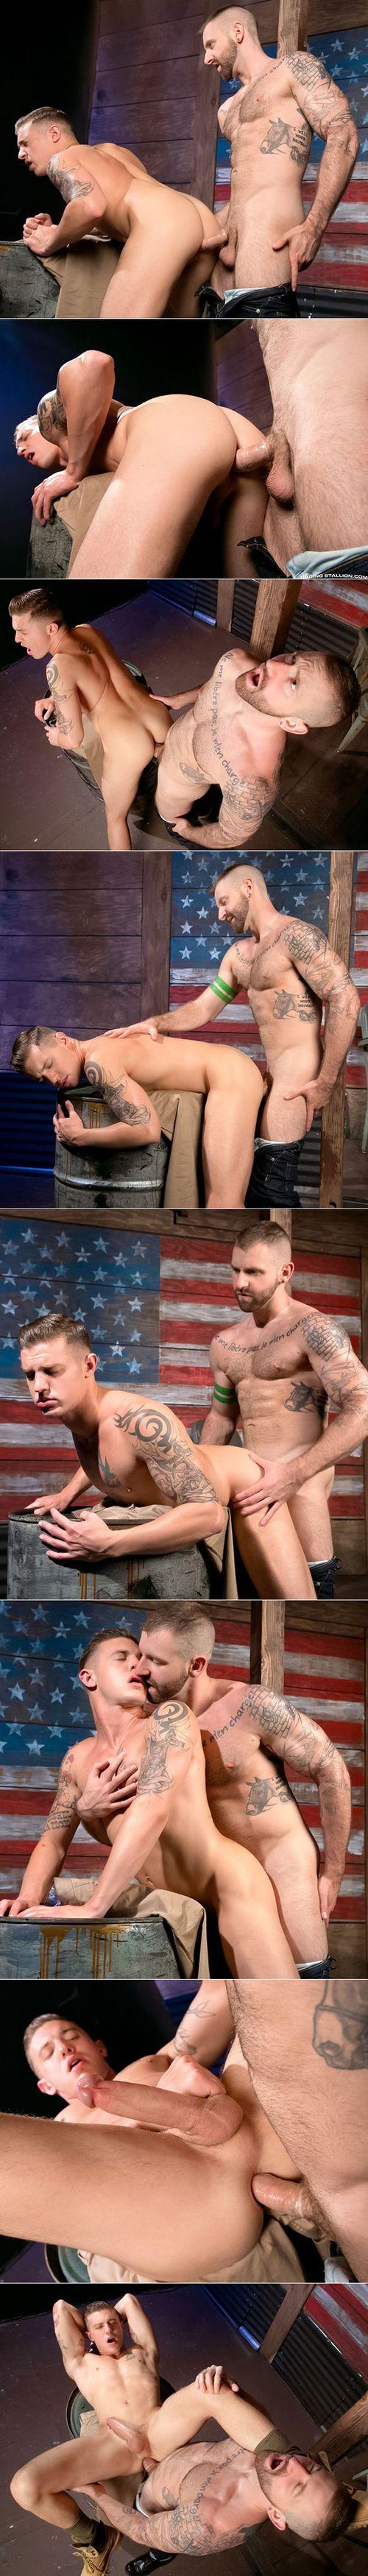 James-Ryder-Aleks-Buldocek-RagingStallion-5